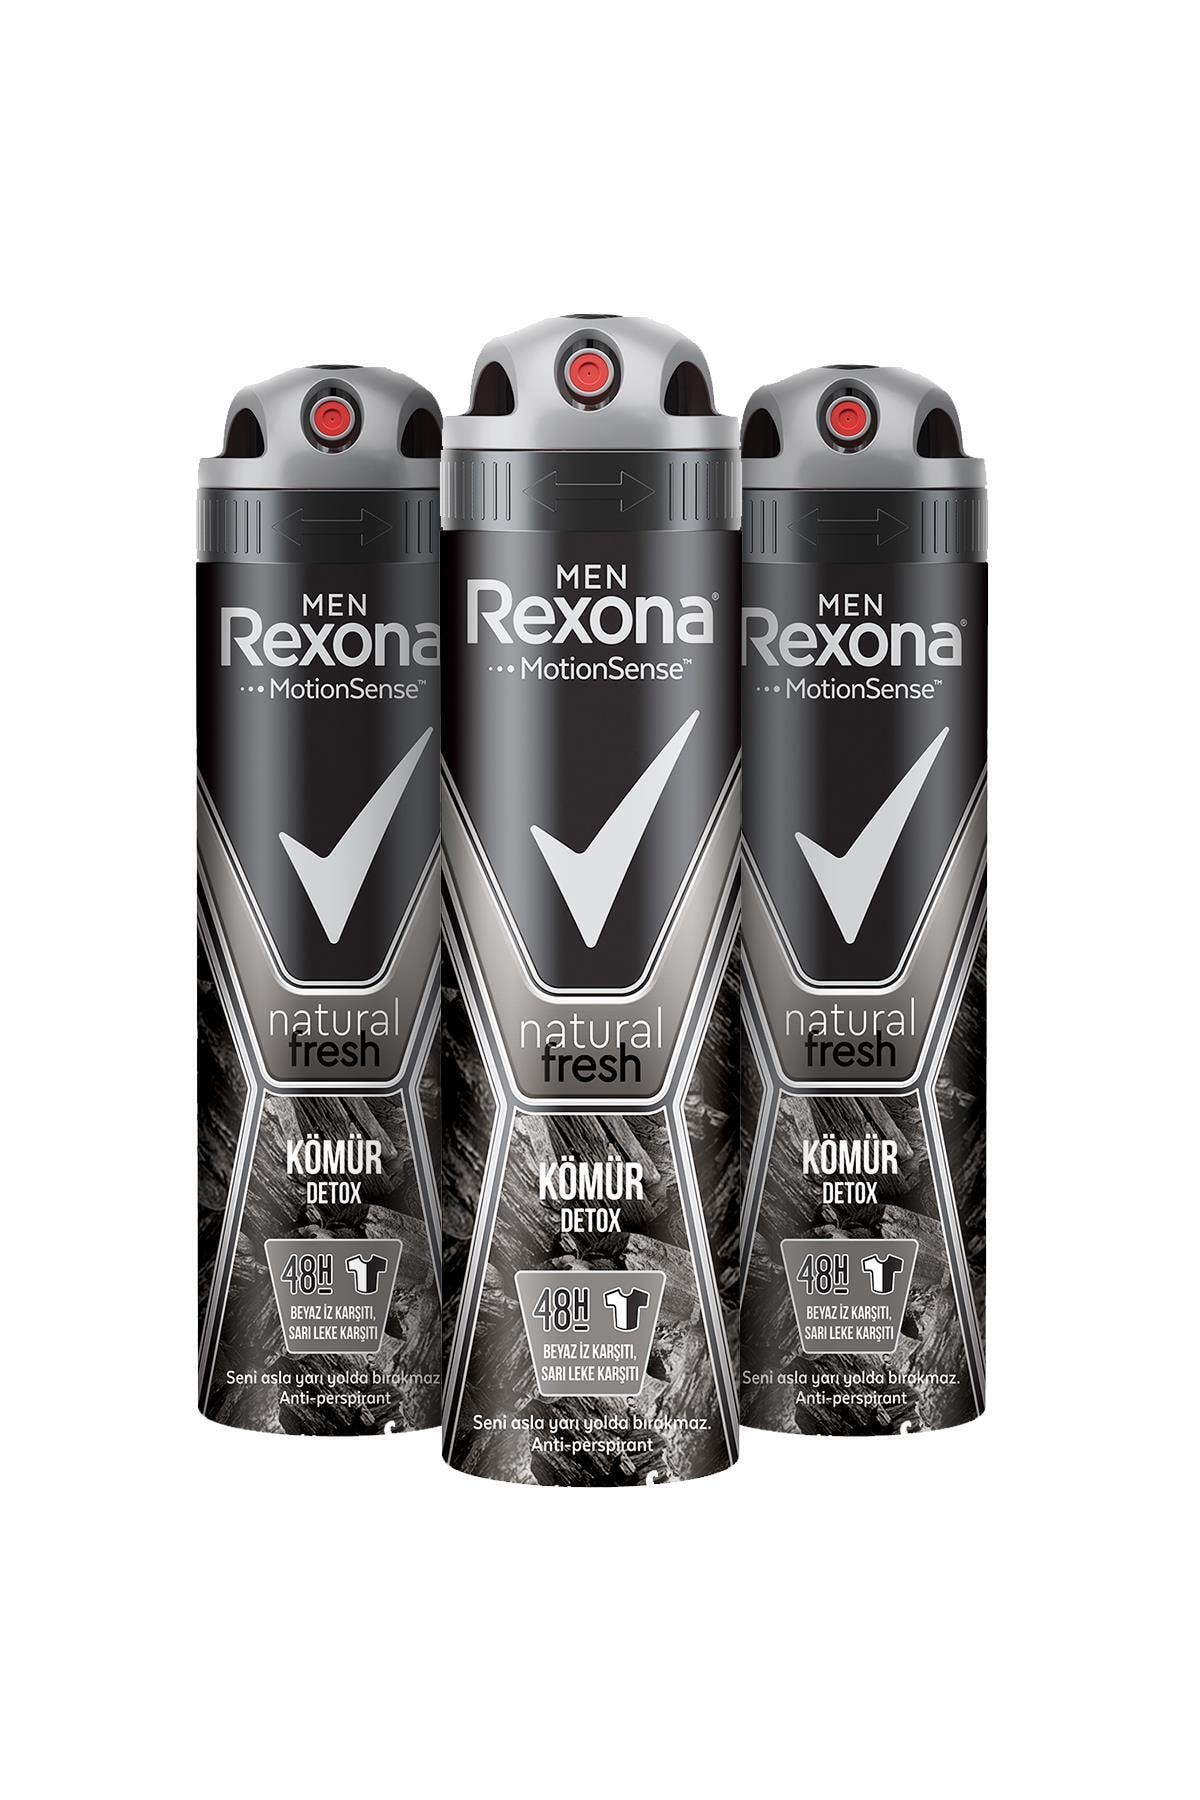 Rexona Men Natural Fresh Kömür Detox Erkek Sprey Deodorant 150 ml x3 1